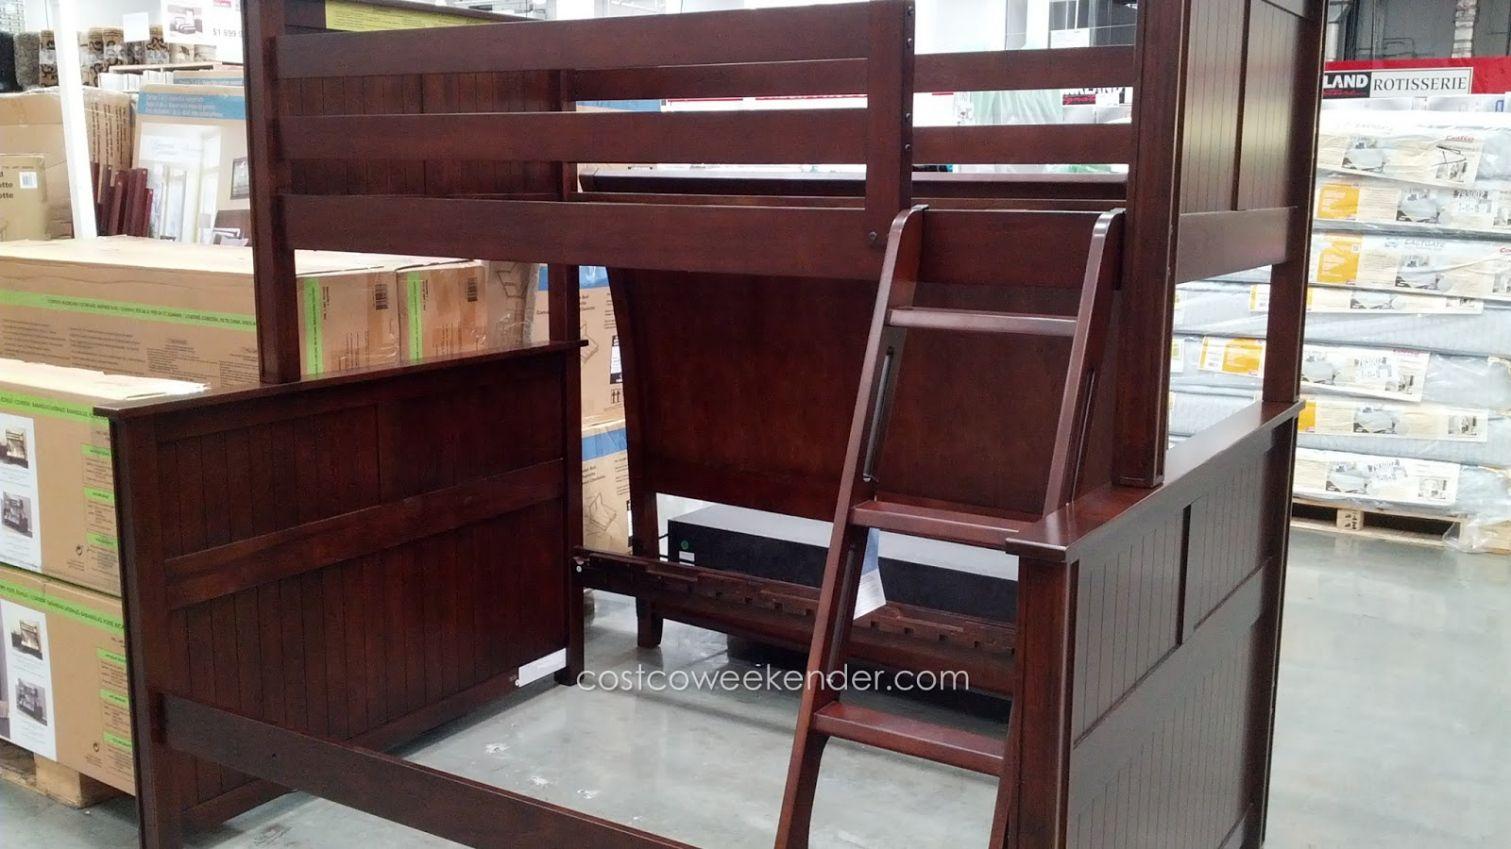 30 Staircase Bunk Bed Costco Interior Design For Bedrooms Check